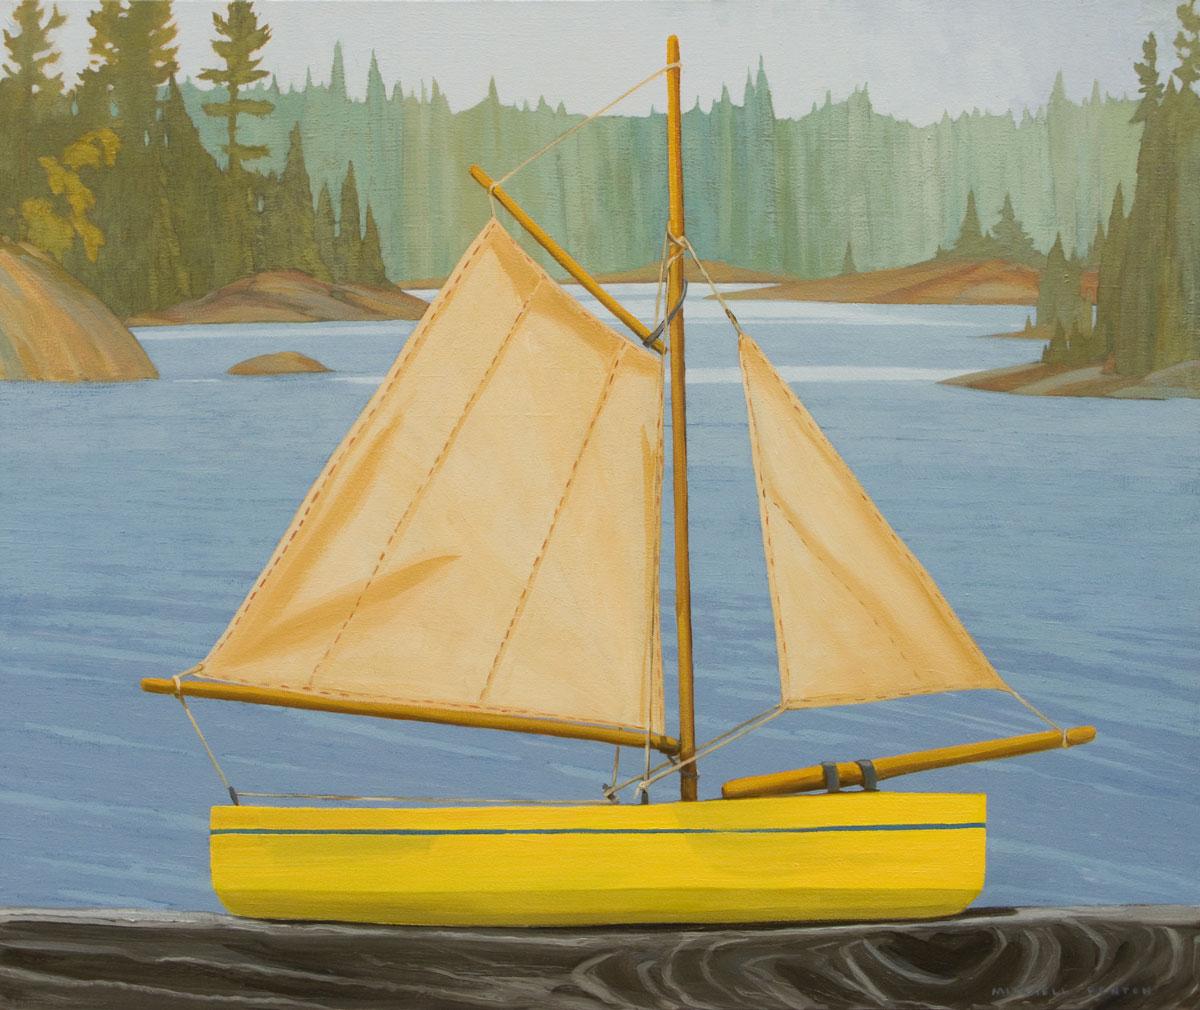 fenton-yellow-pond-yacht-32x38-2012.jpg